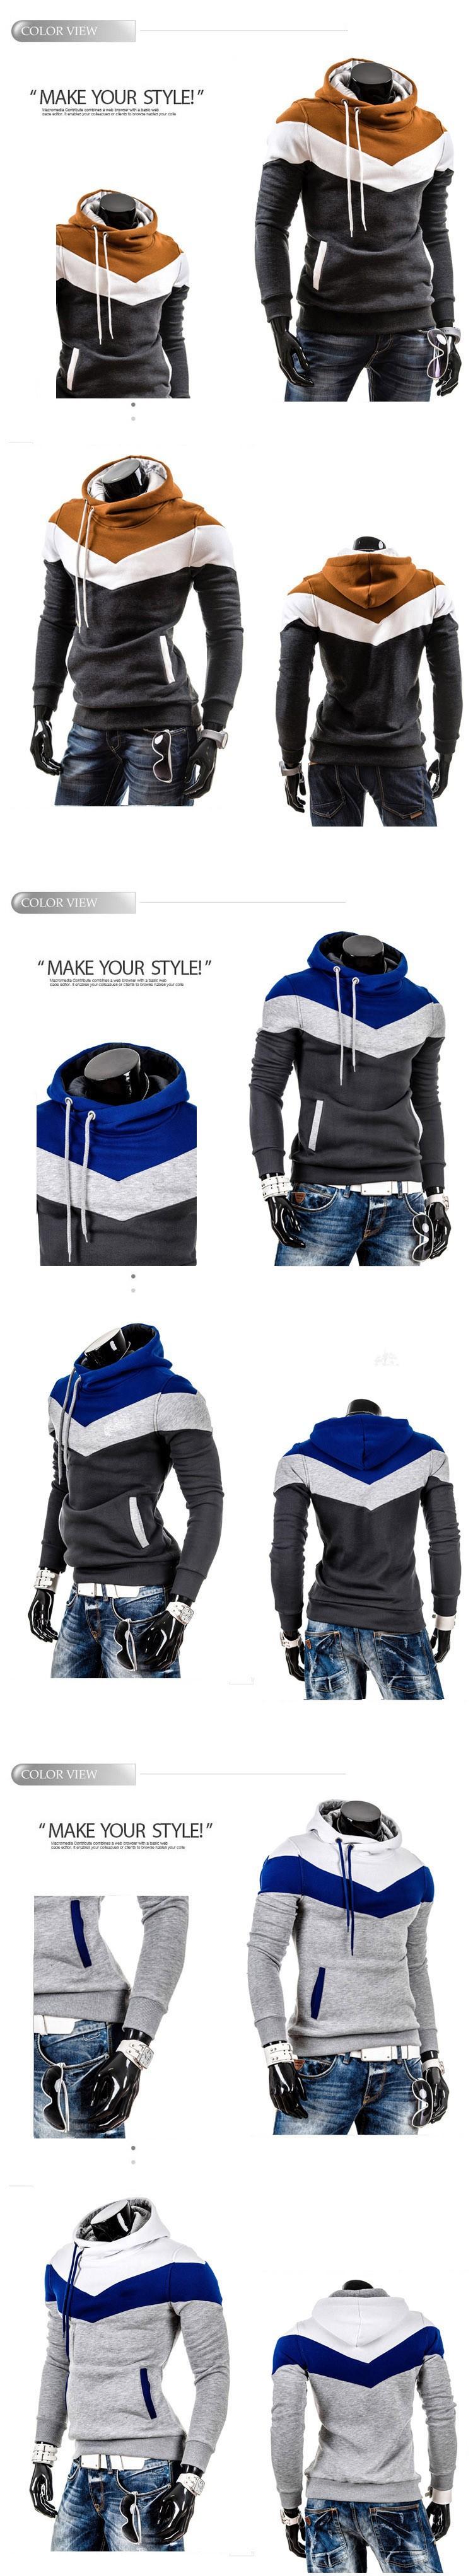 6-2015 New Arrival Hoodies Men Solid Color Fashion chandal hombre sudaderas sweatshirt men